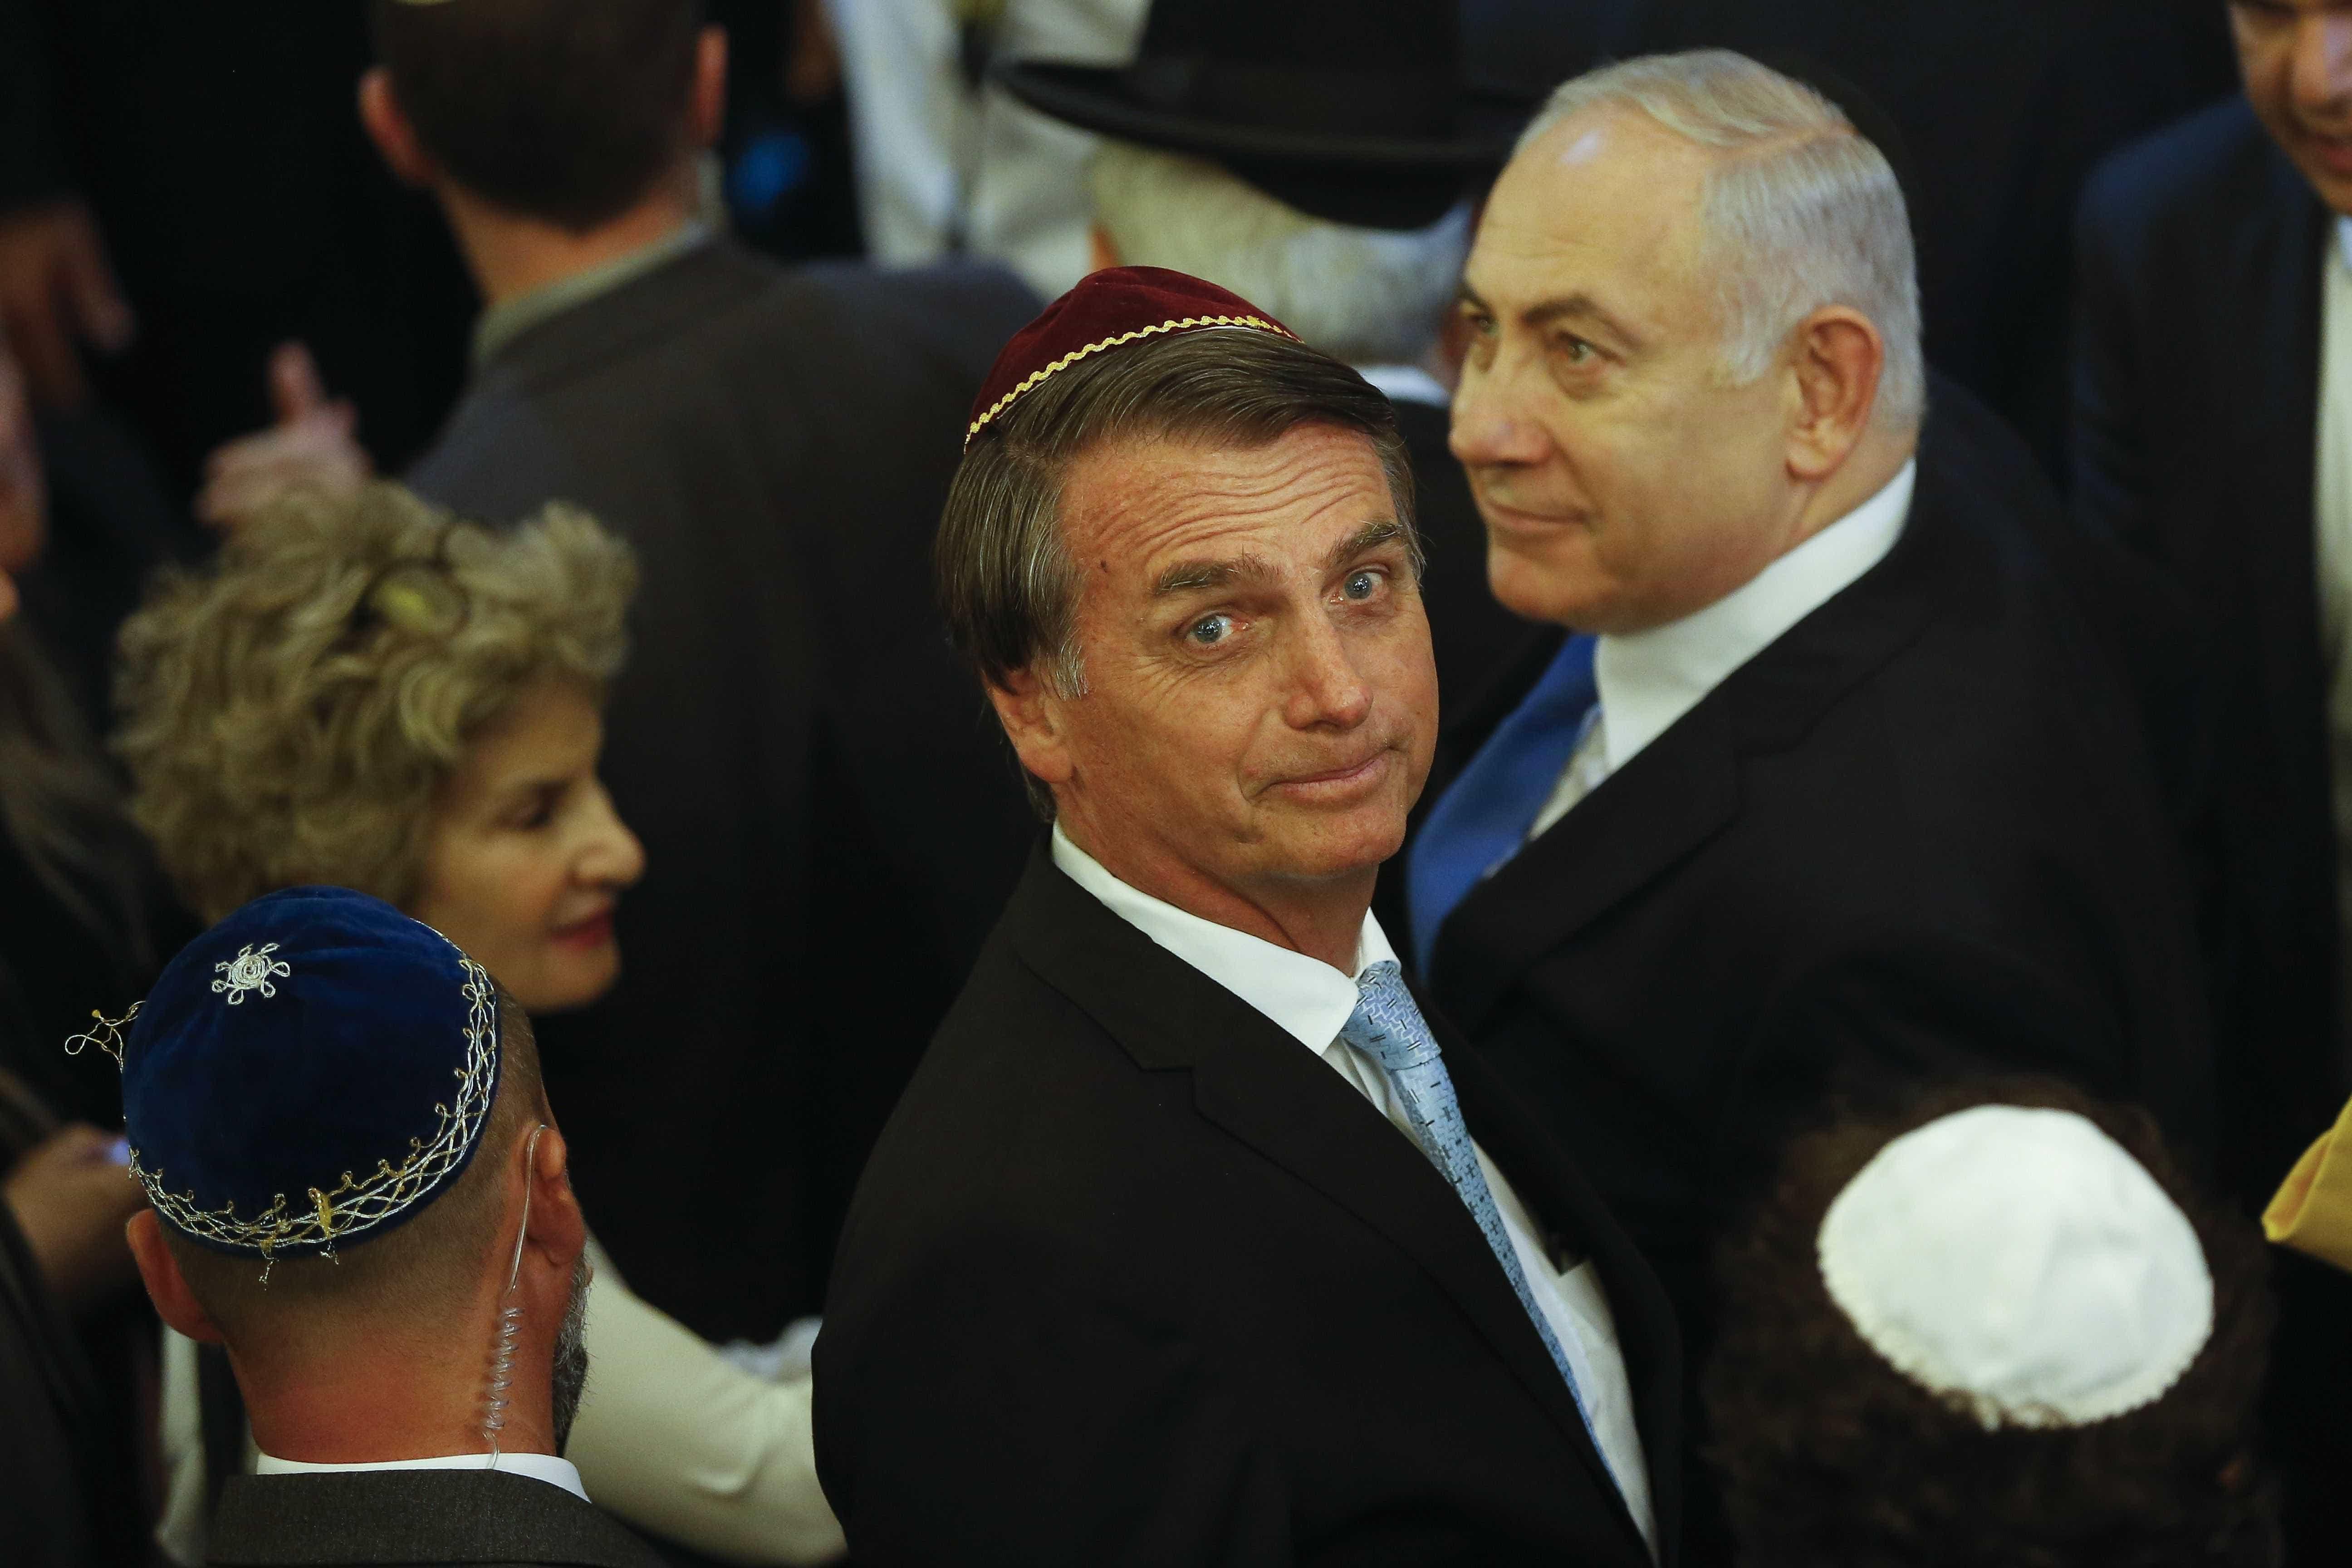 Premiê de Israel puxa coro de 'mito' em visita a sinagoga com Bolsonaro